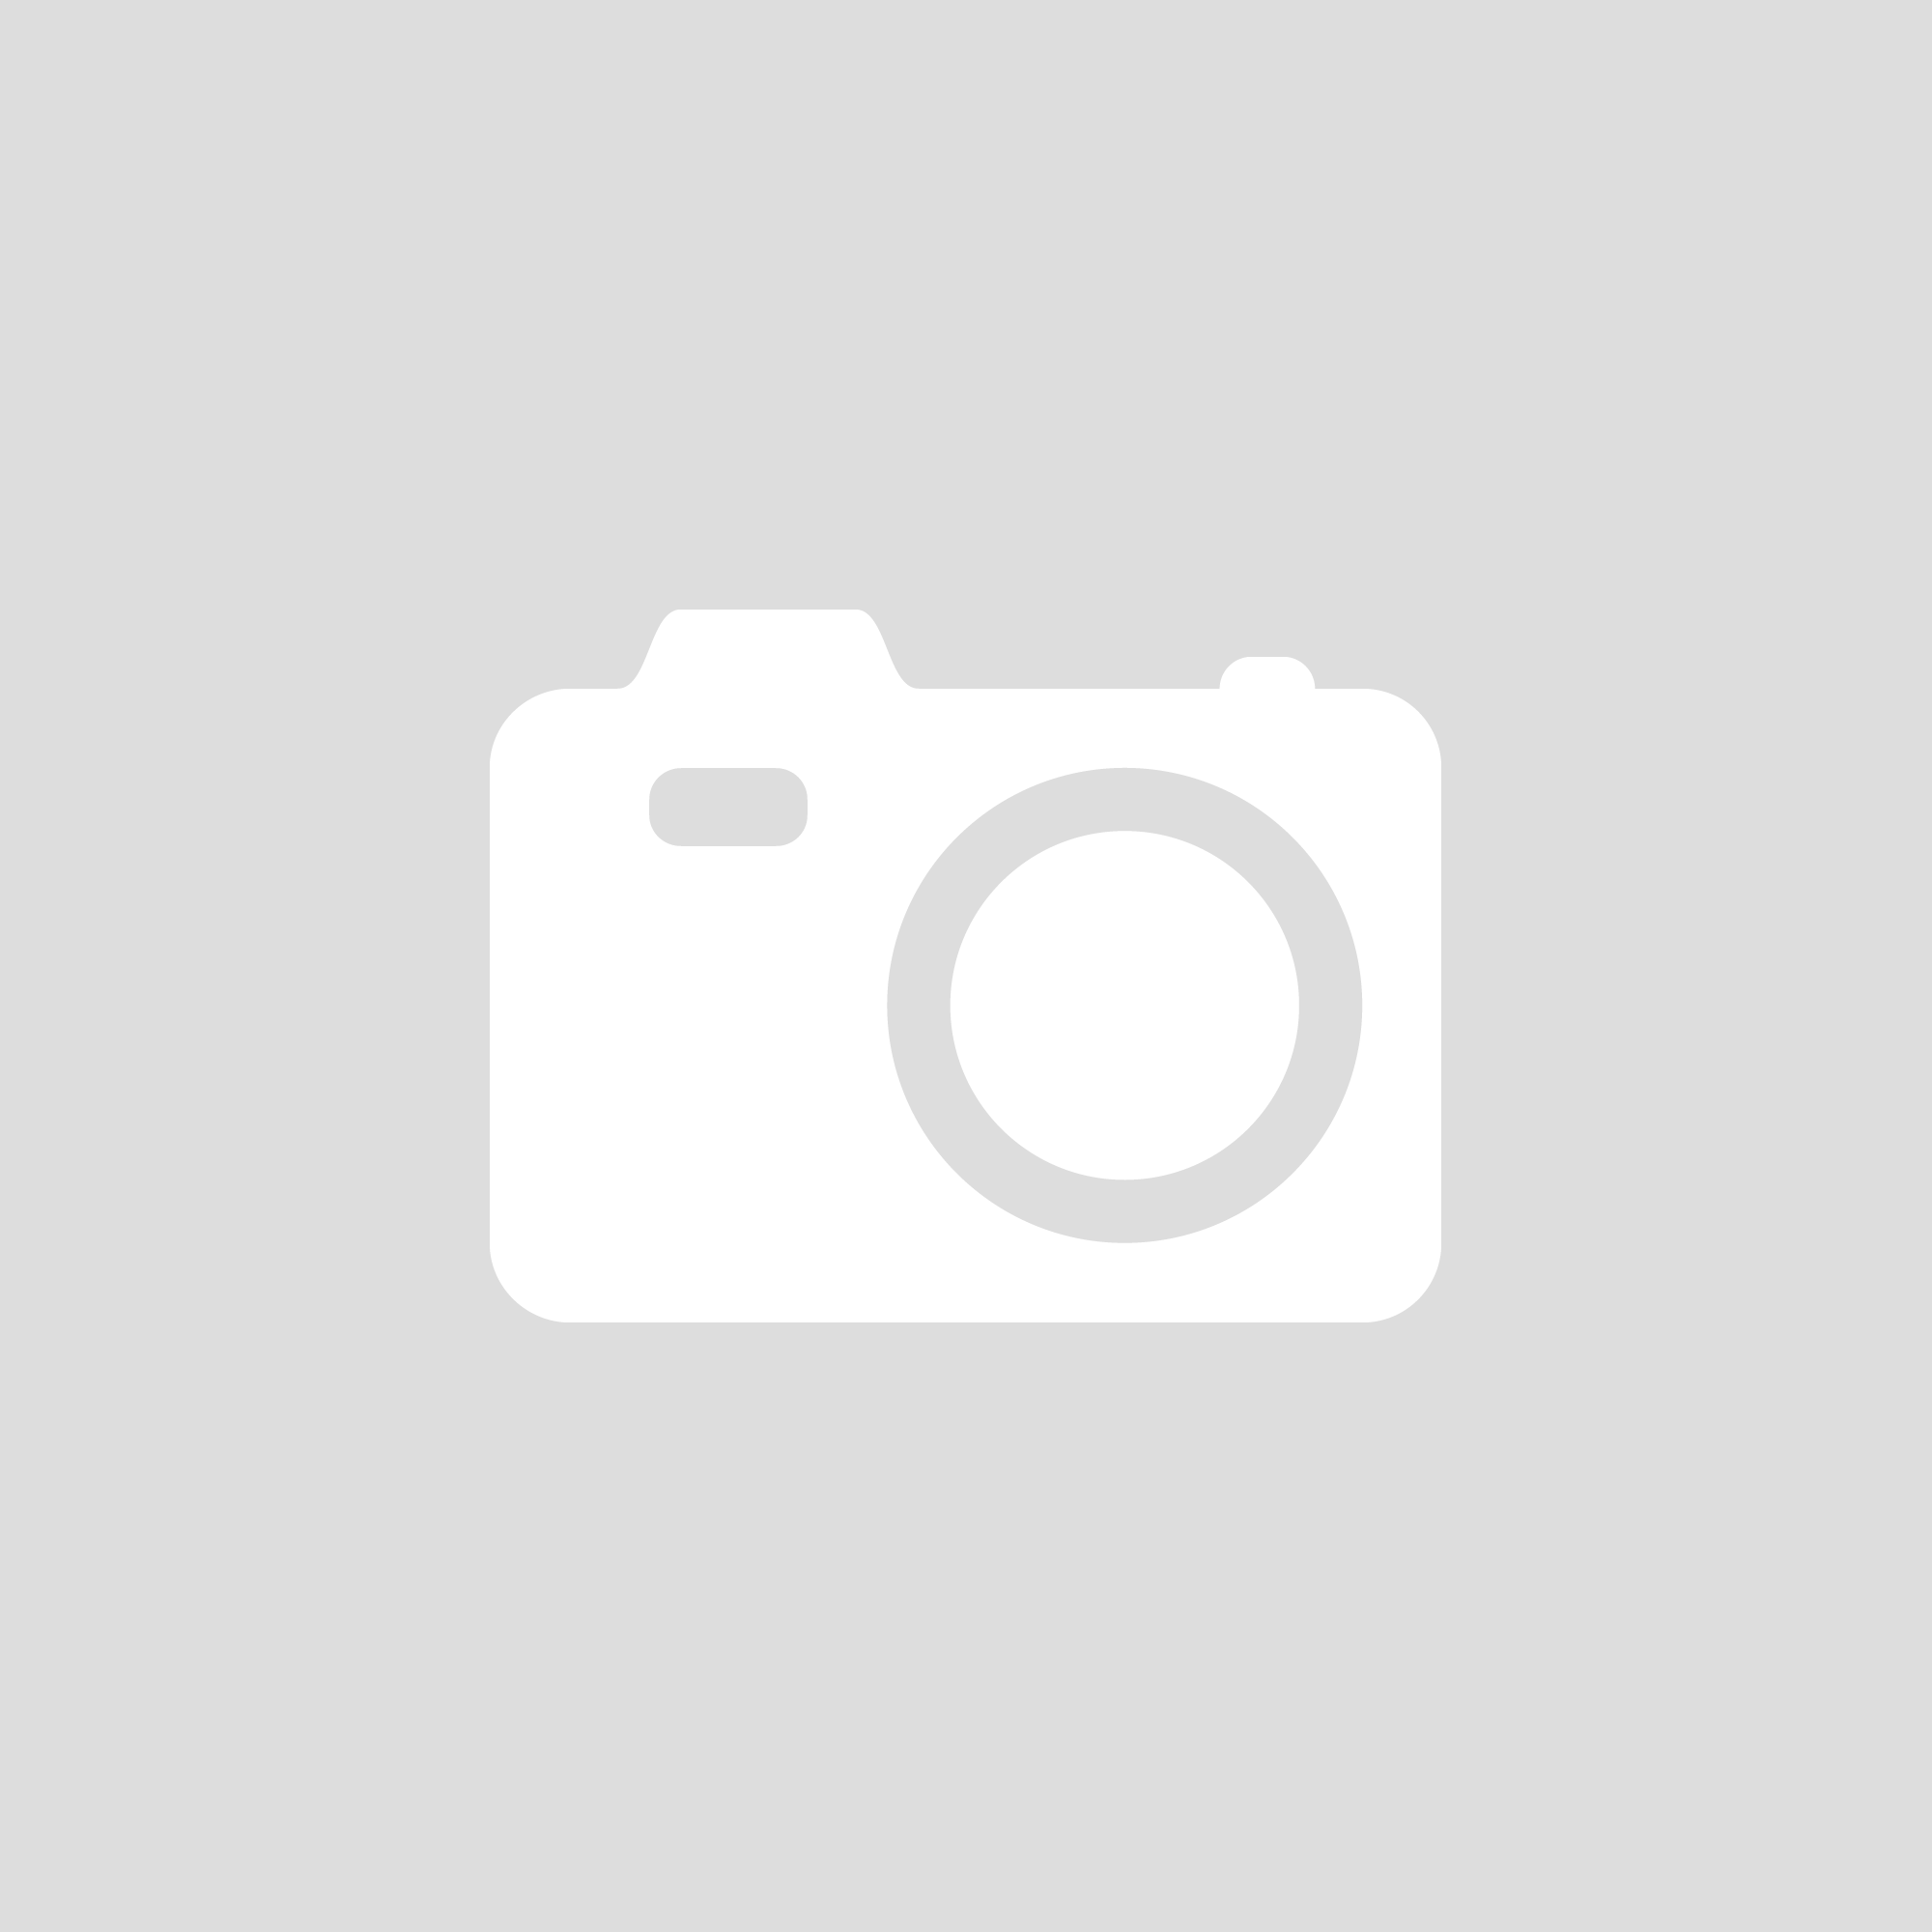 Florentine Lilac Texture Wallpaper by Rasch 277692